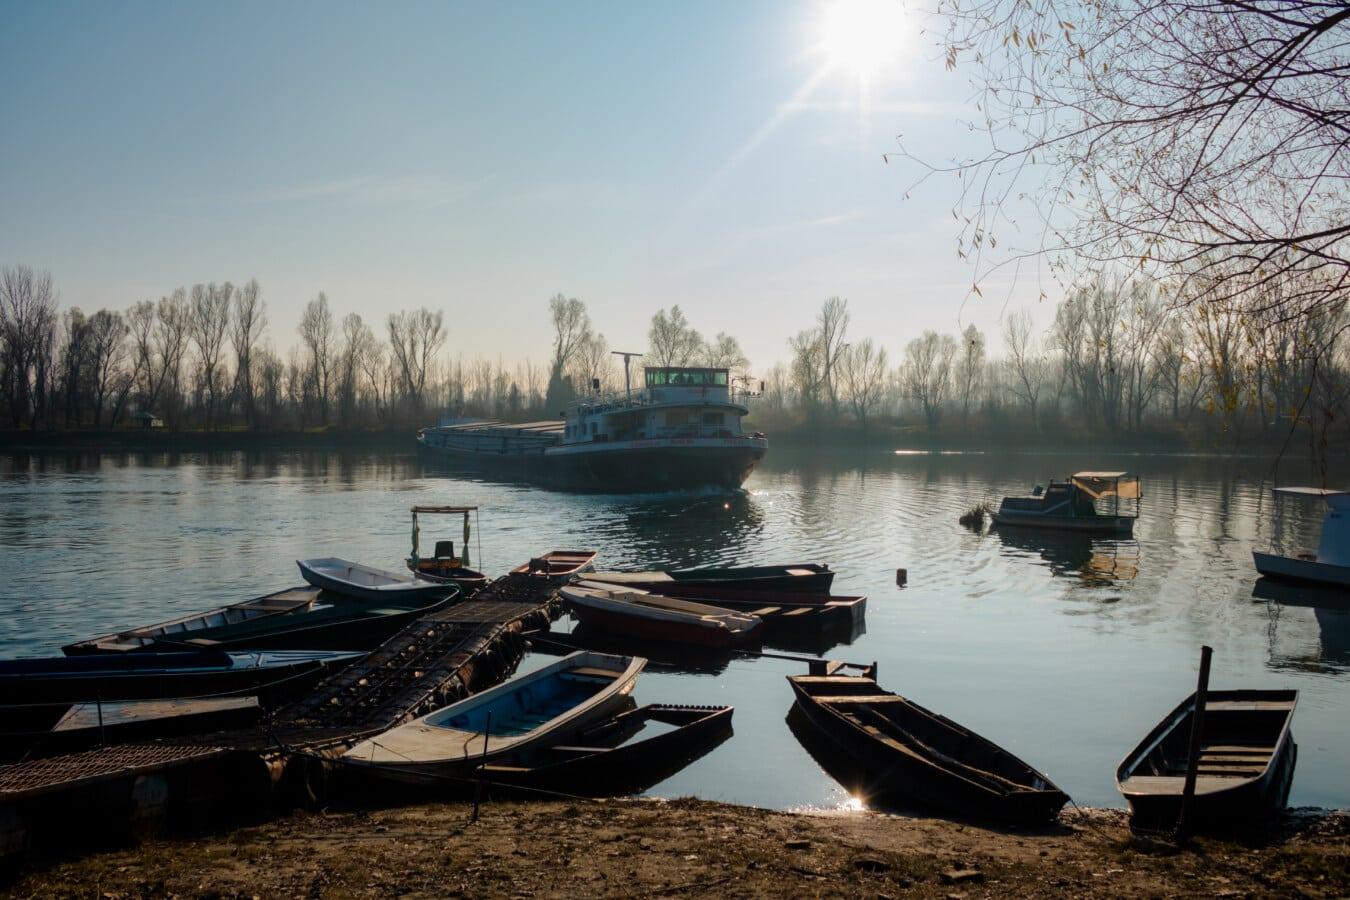 tugboat, barge, harbor, river, river boat, riverbank, sunshine, boat, water, watercraft